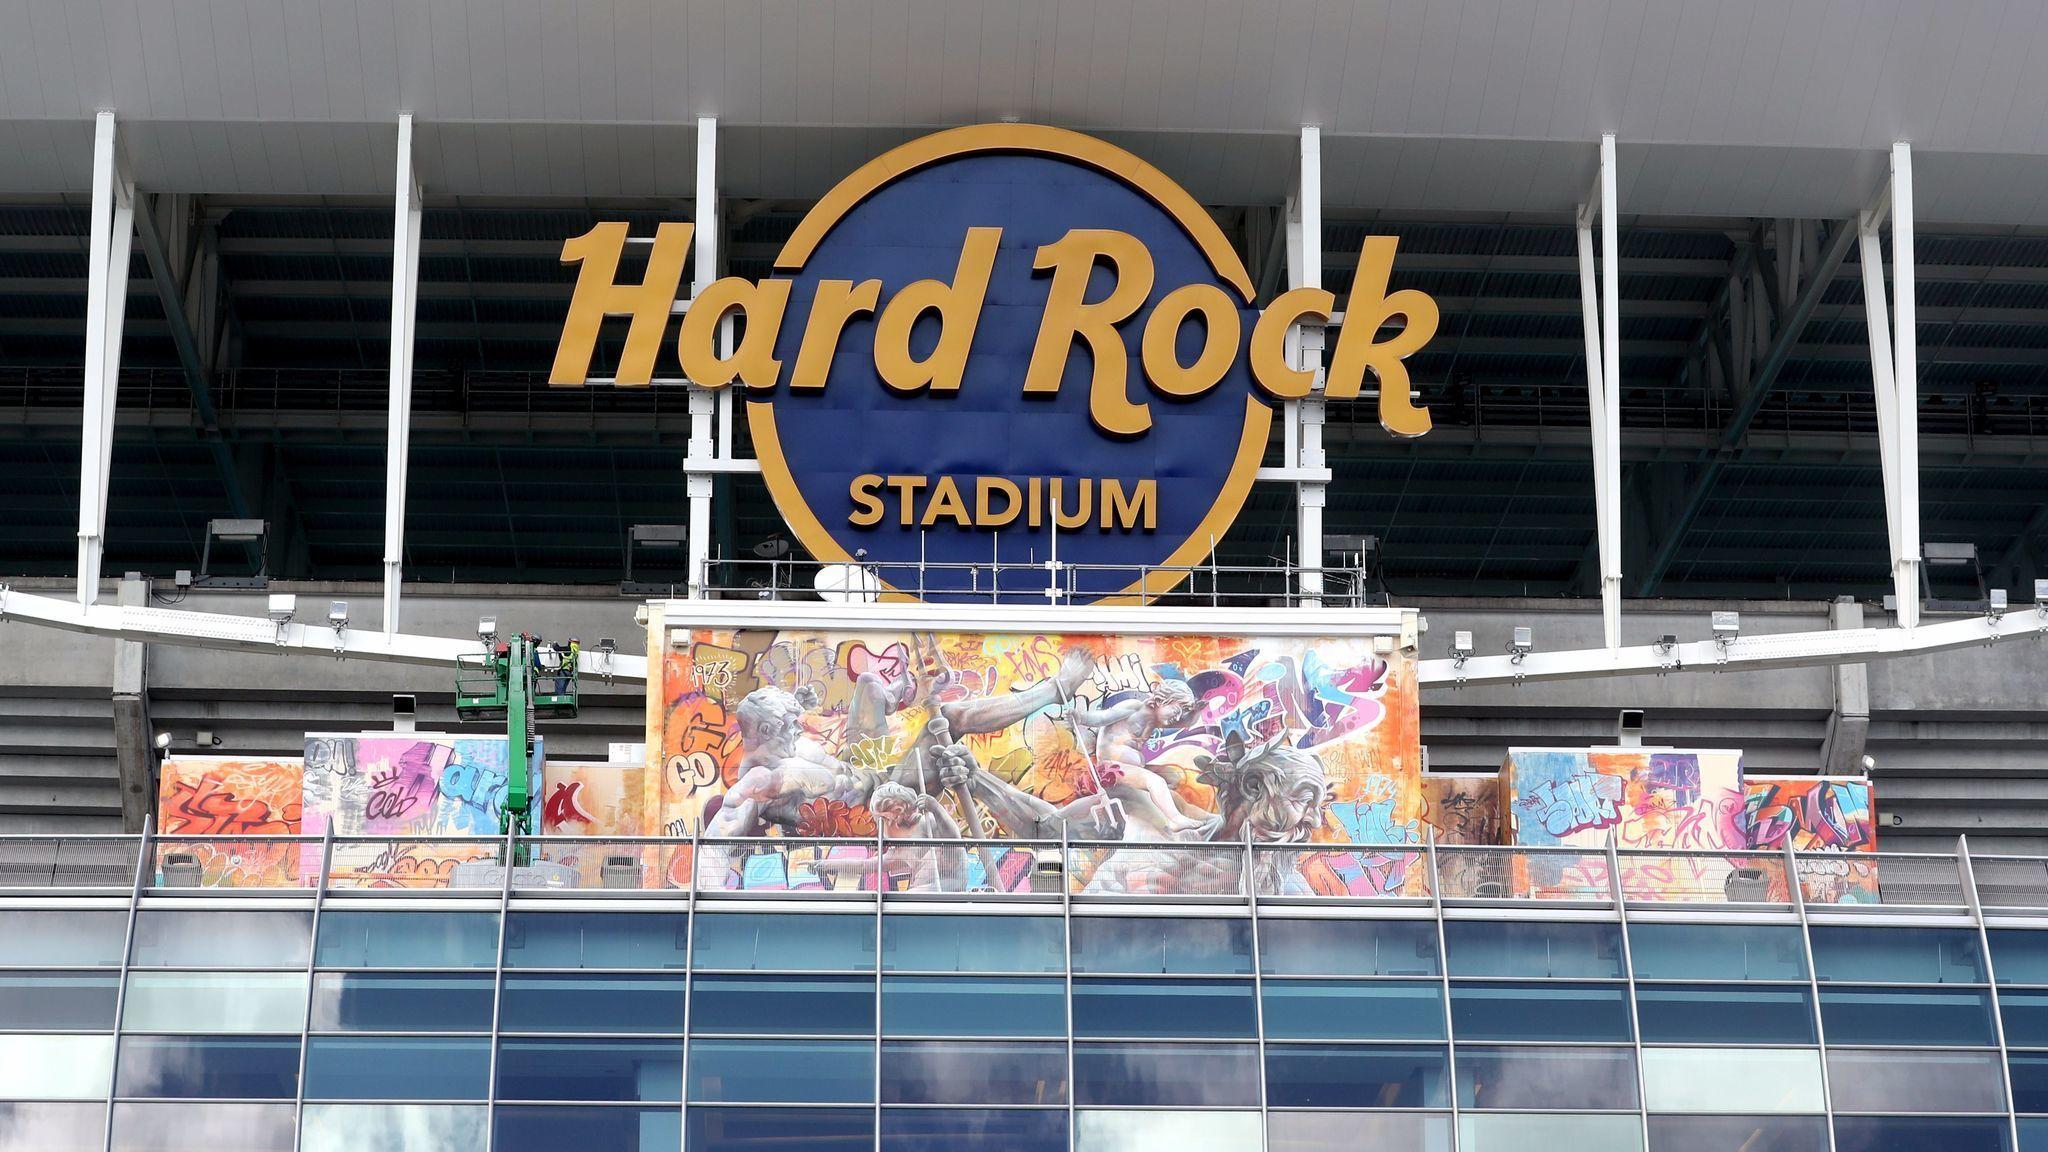 Latest Hard Rock Stadium Renovations Improve Amenities